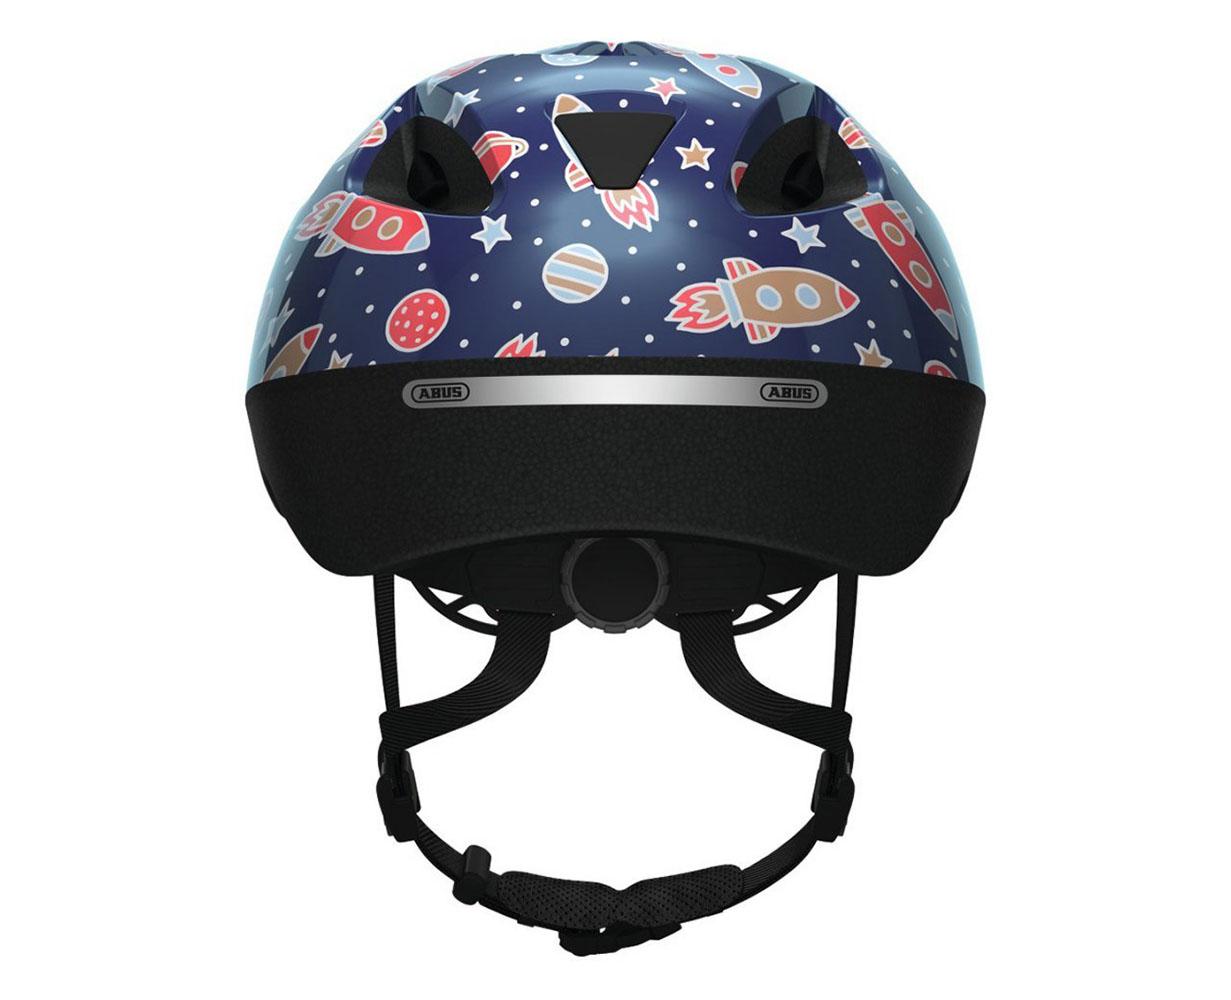 KACIGA ABUS SMOOTY 2.0 BLUE SPACE